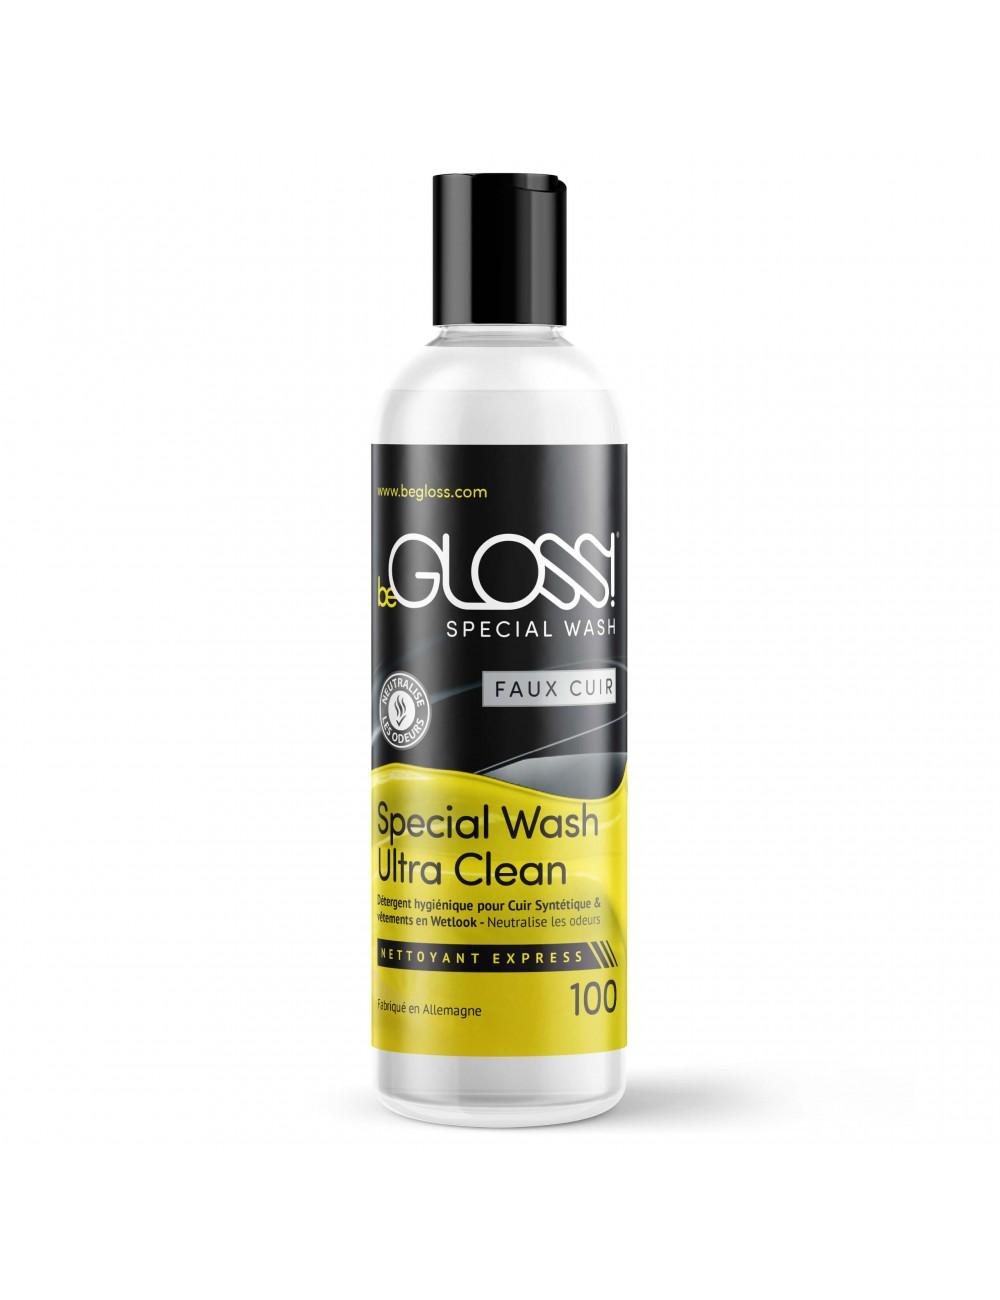 Spray Nettoyant Faux Cuir et Wetlook 100ml Begloss